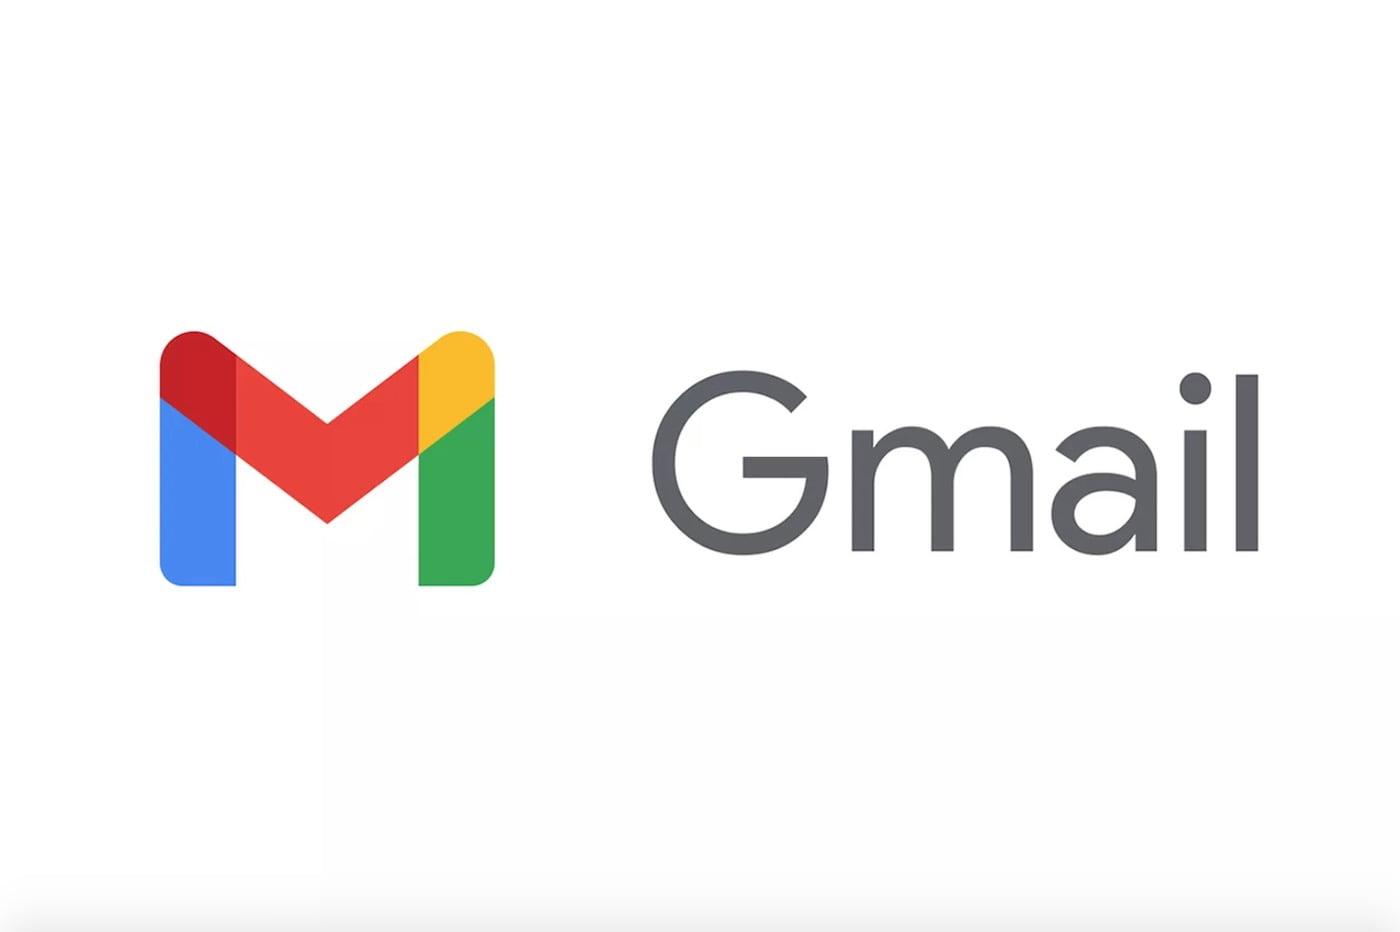 gmail logo 2020